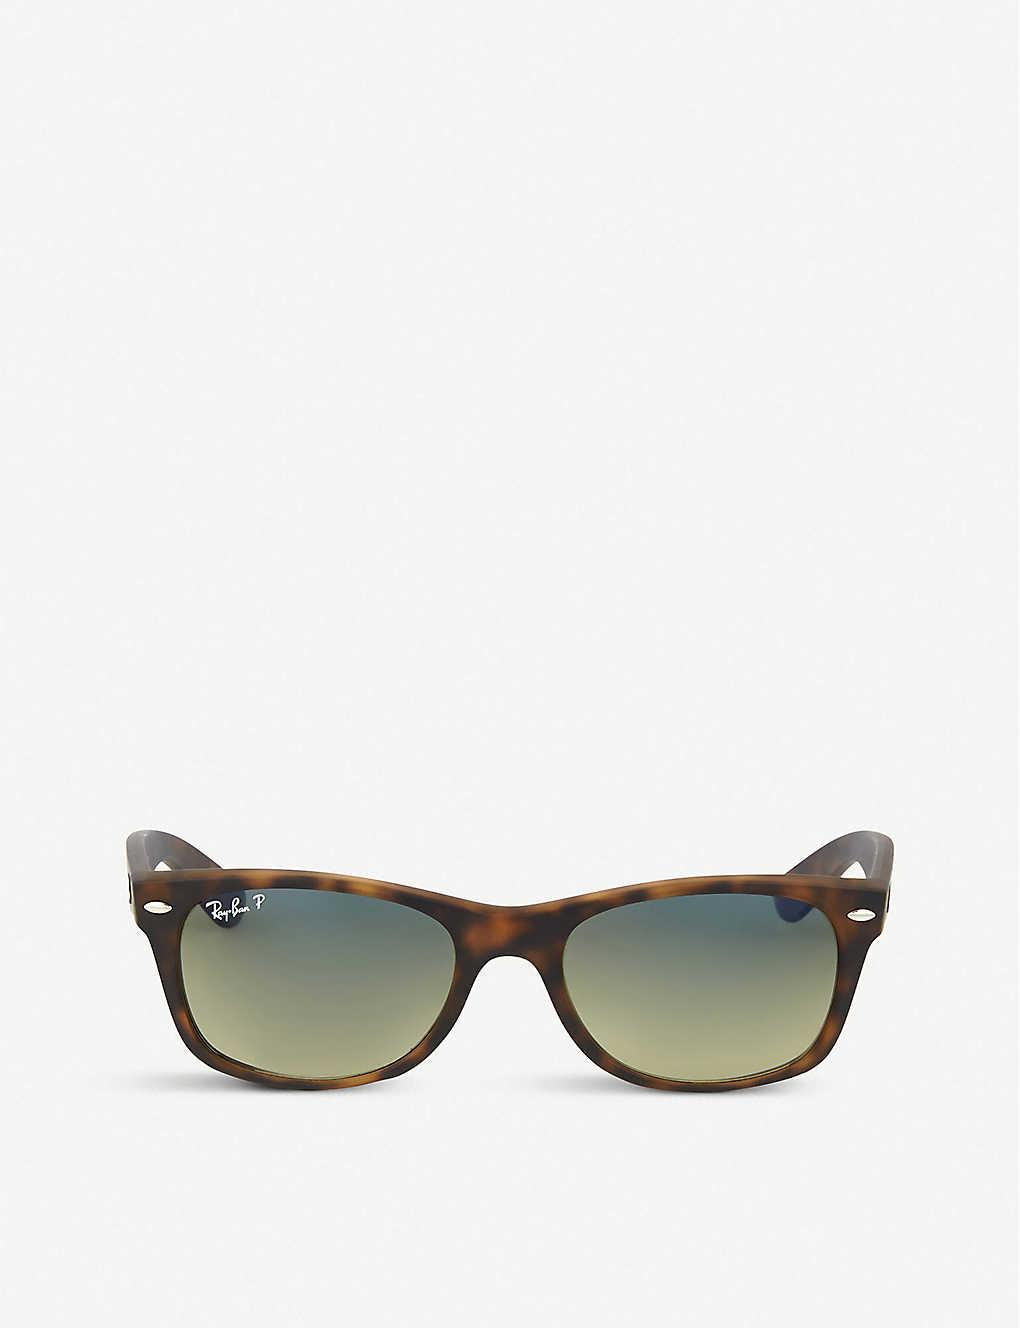 cee158463592 Matte Finish Wayfarer Sunglasses